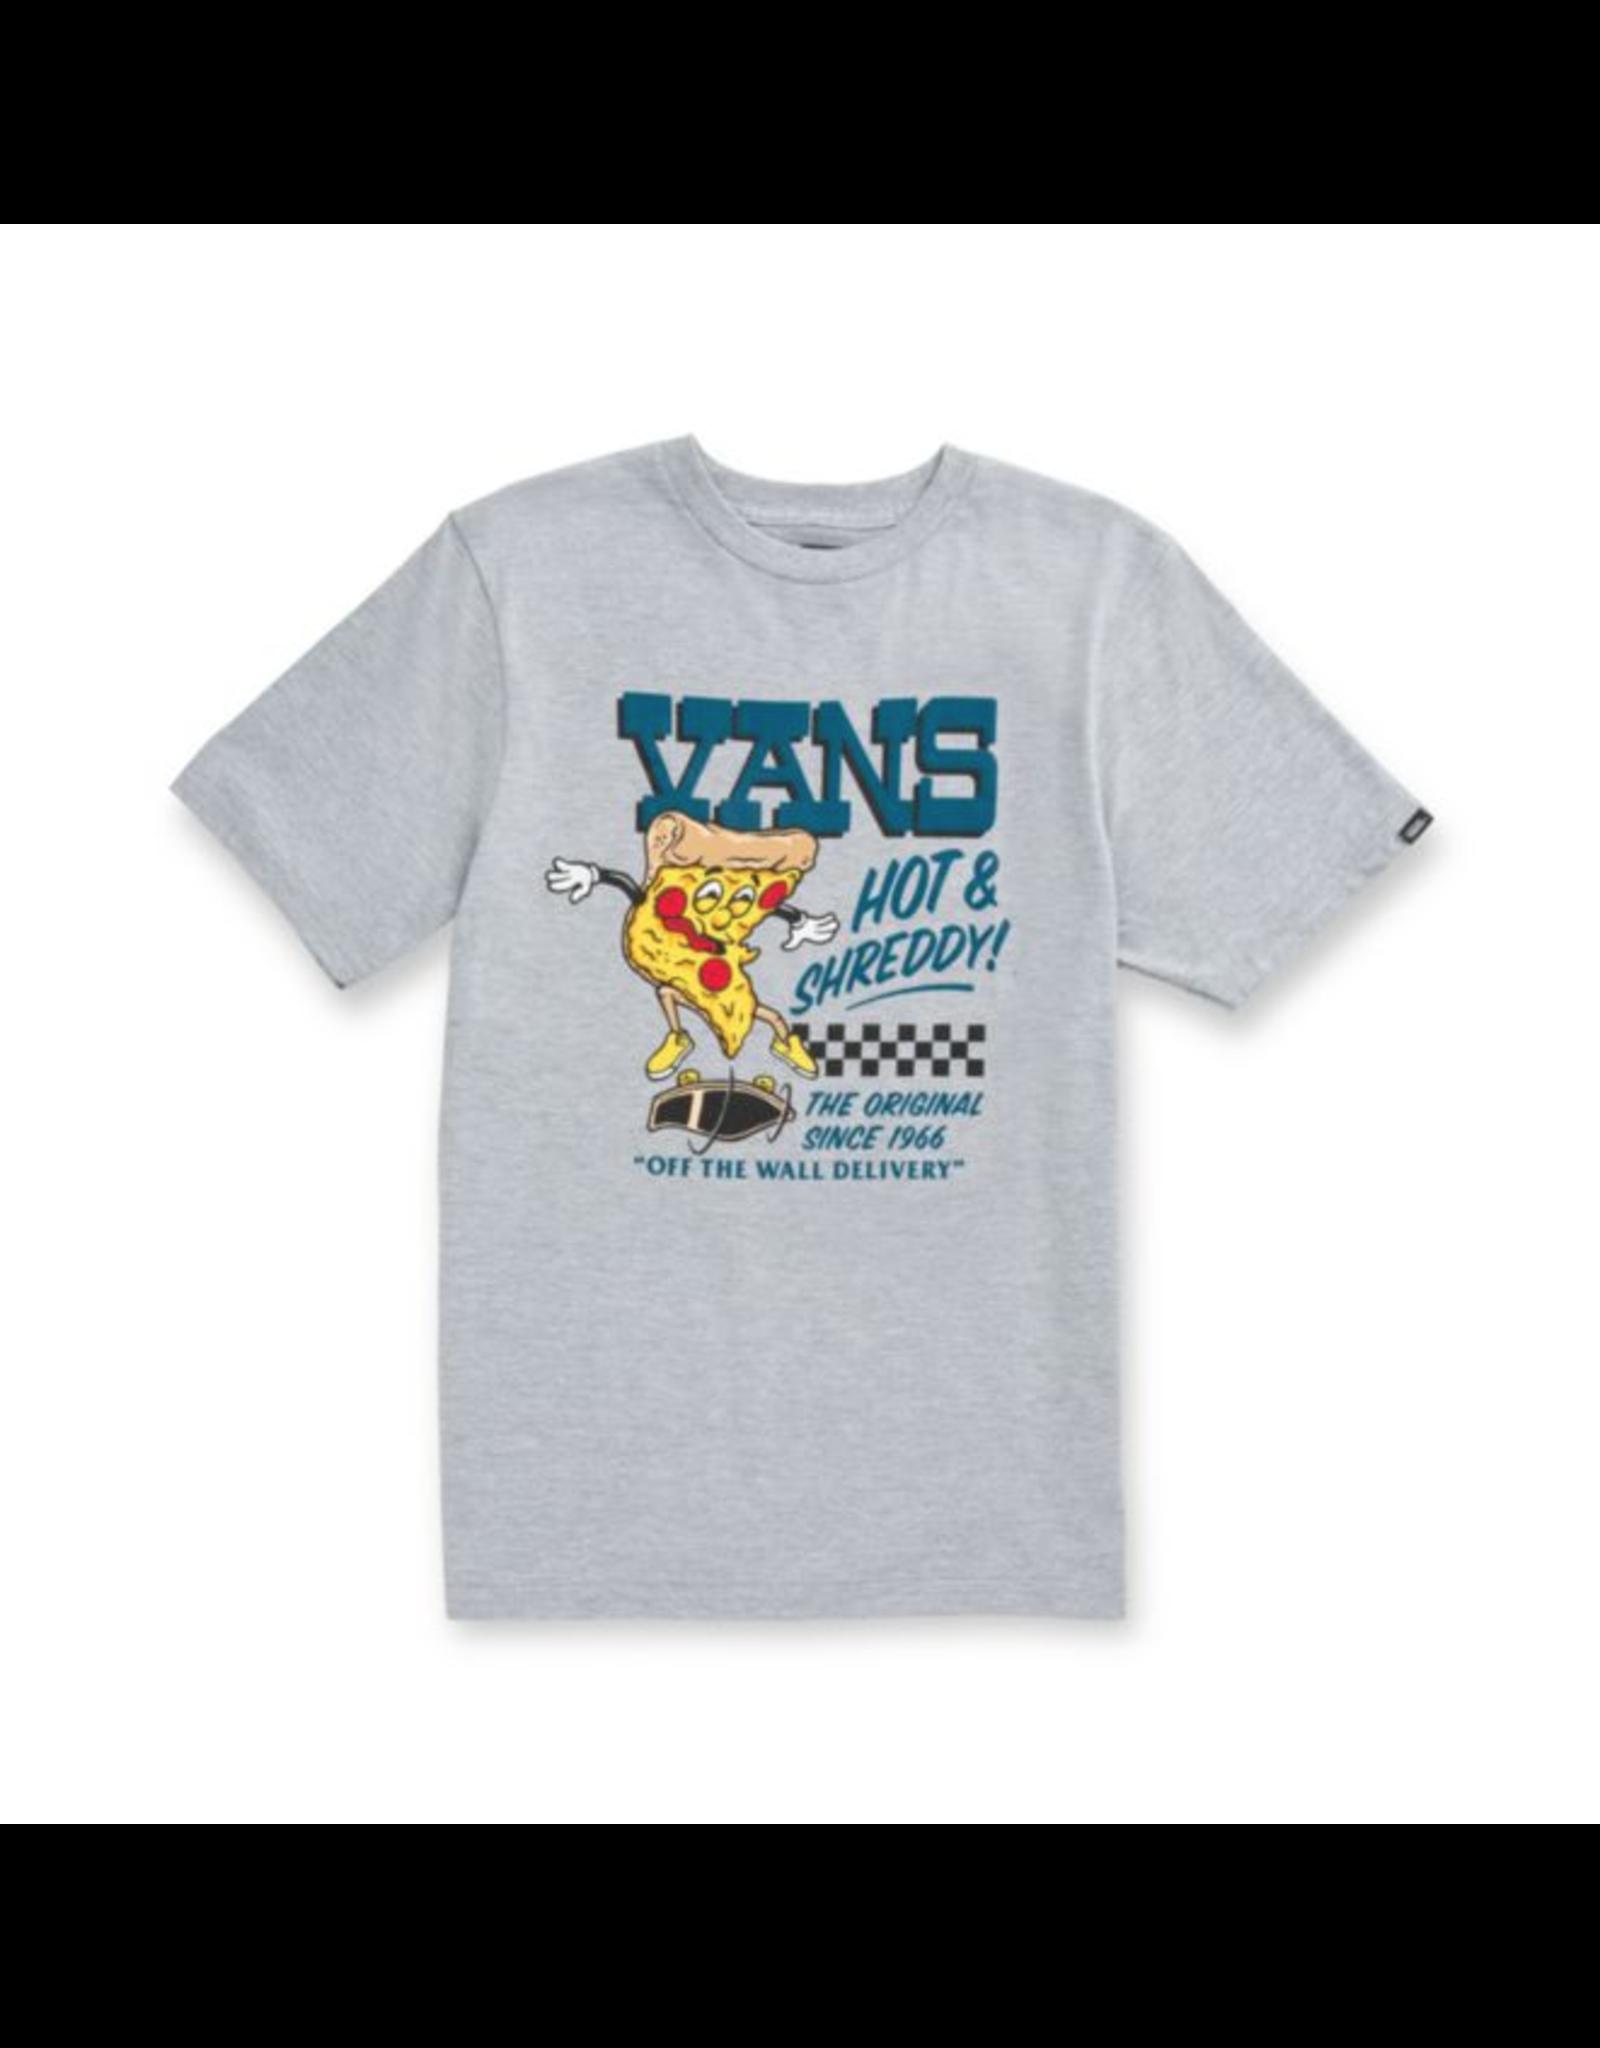 Vans Shredy T-Shirt - Athletic Heather